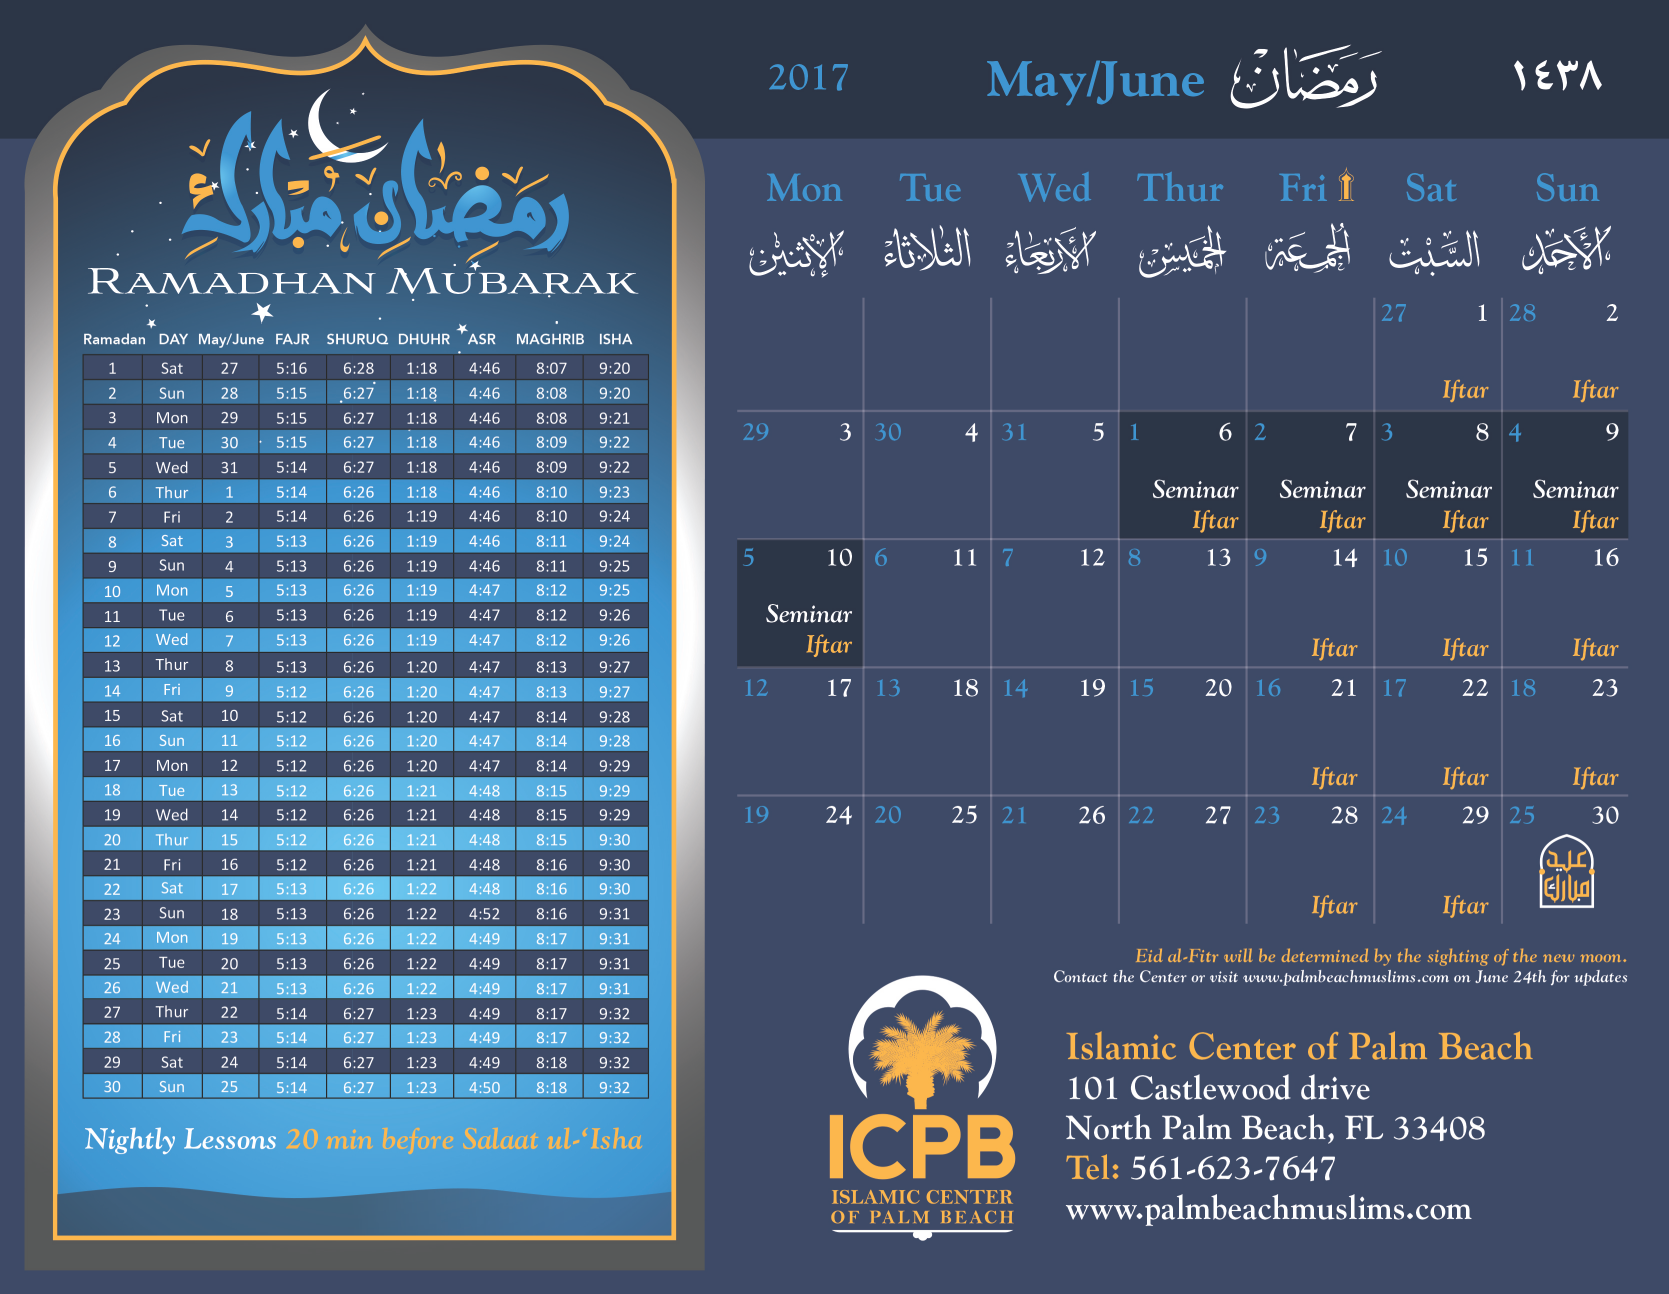 Ramadan 1438/2017 Prayer Times Calendar (North Palm Beach, FL)